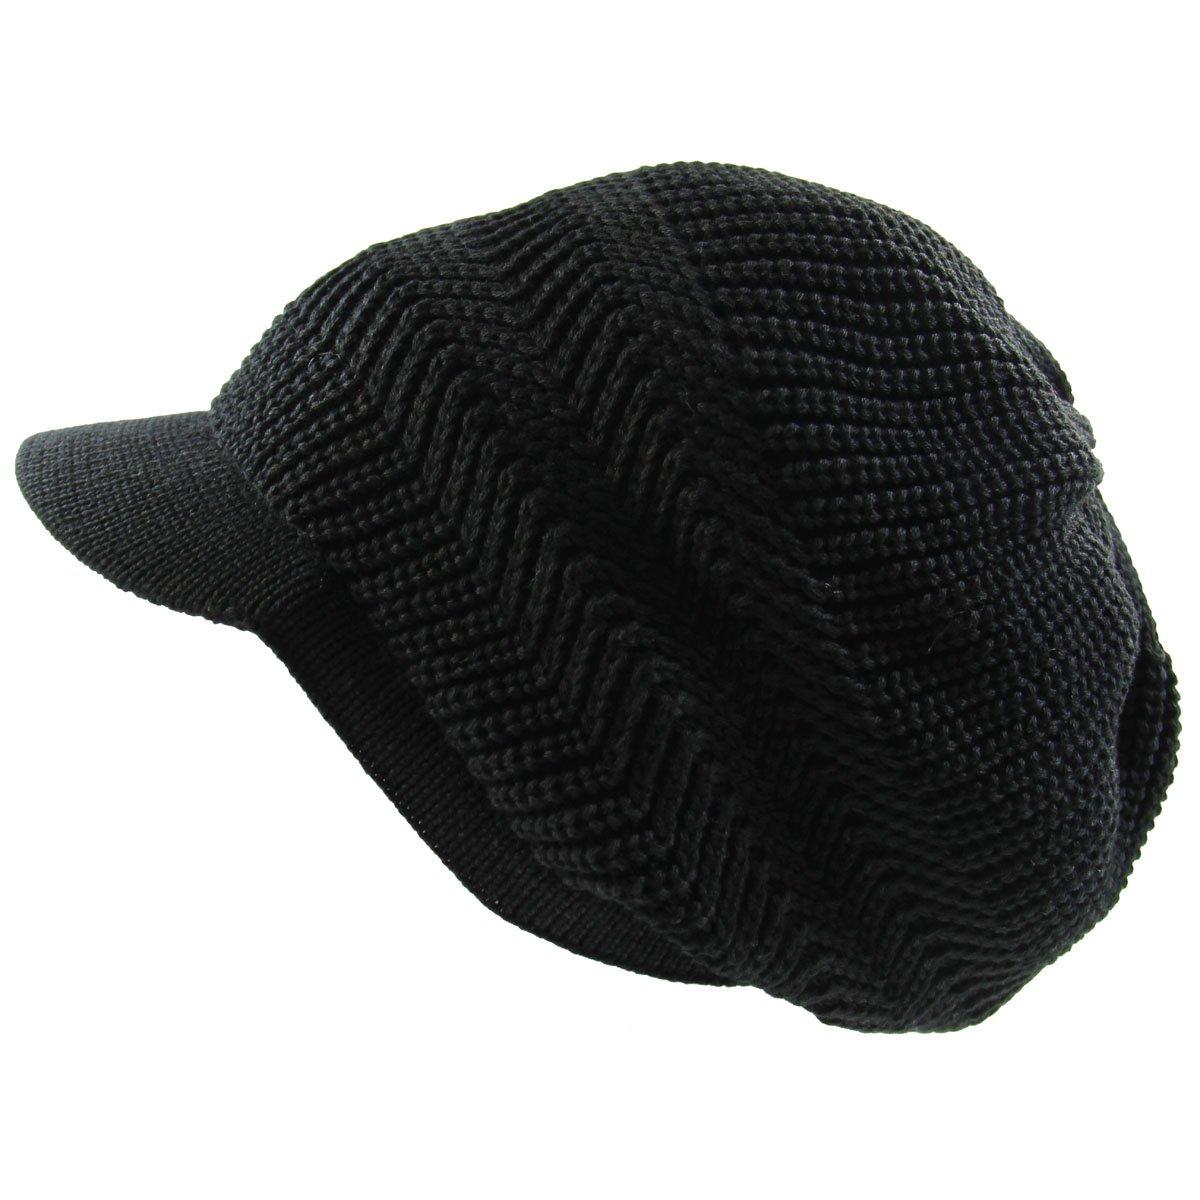 9ed7fea4e00 RW Knitted Cotton Rasta Slouchy Beanie Visor (Black) at Amazon Women s  Clothing store